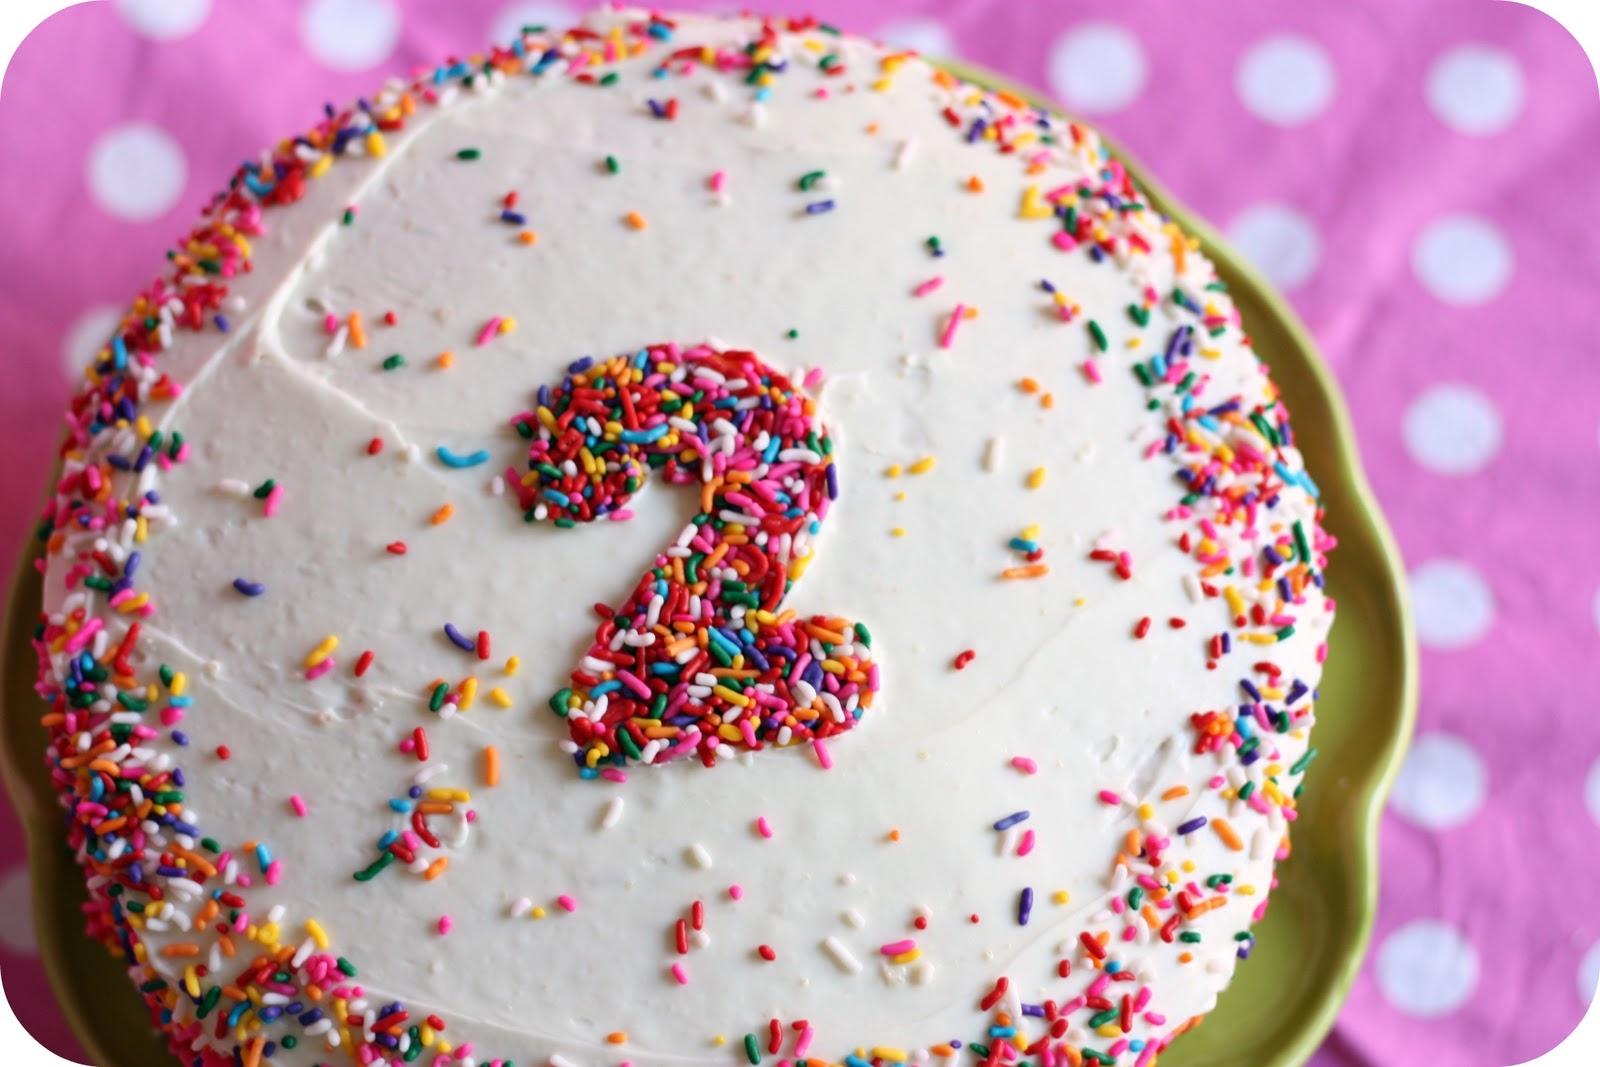 Simple Homemade Birthday Cake - littlelifeofmine.com